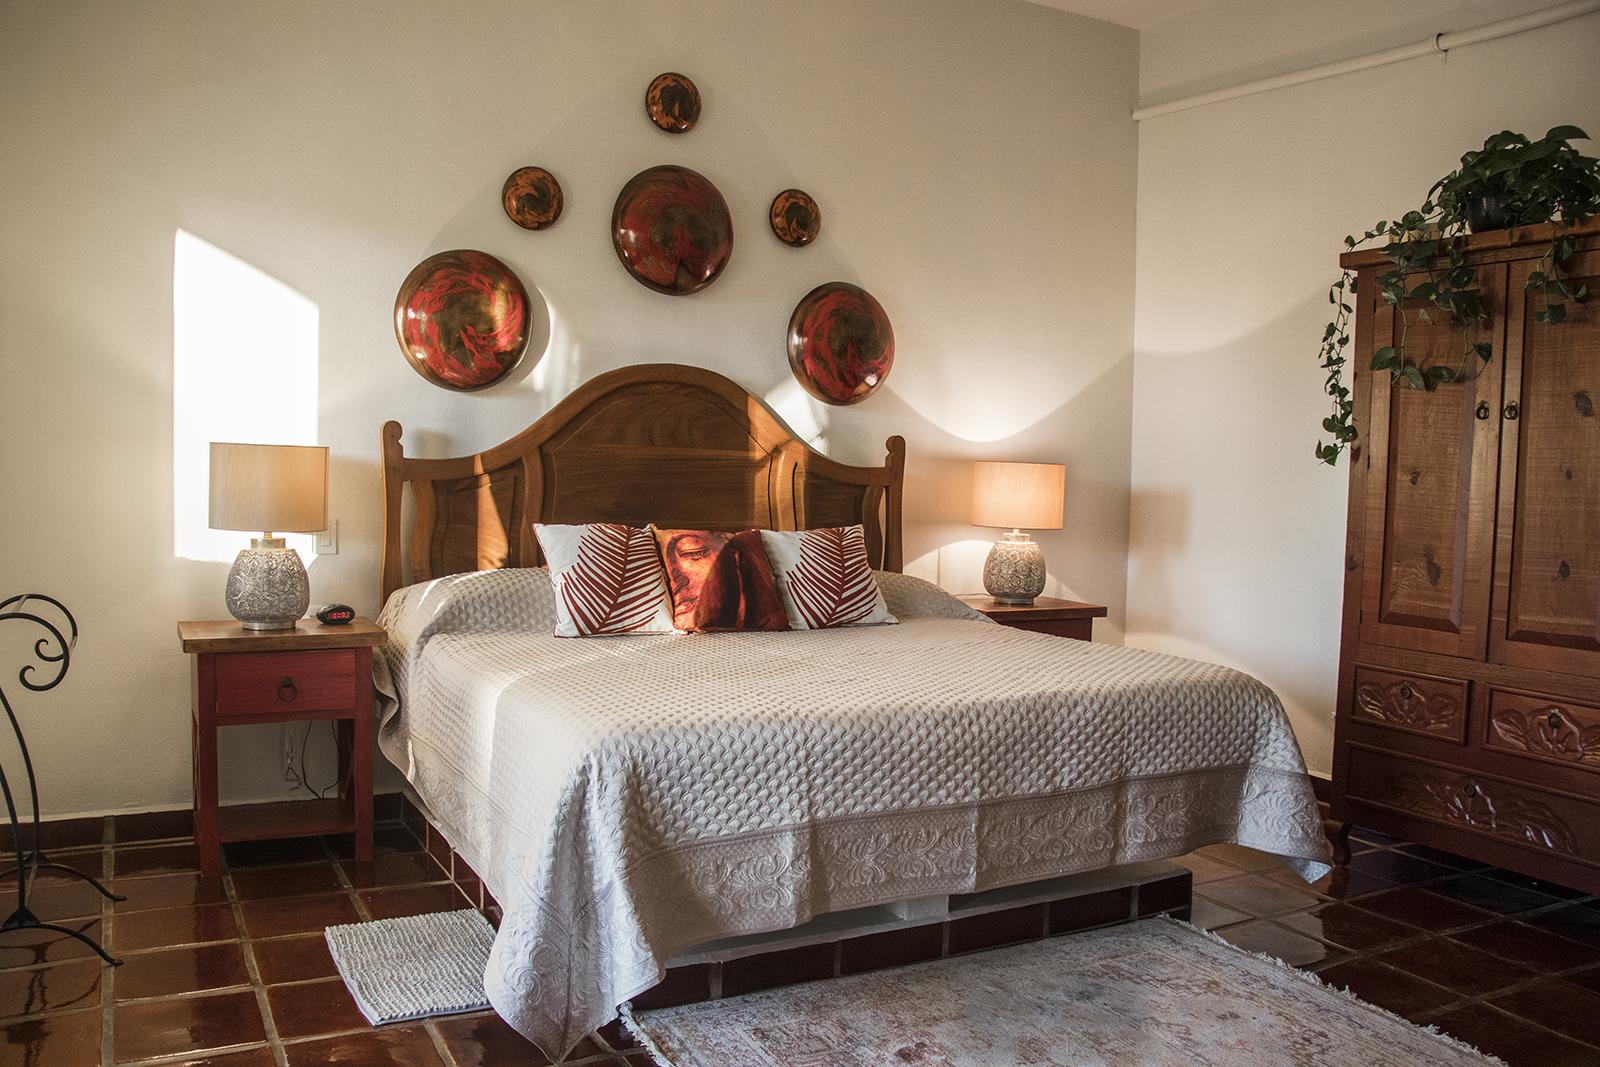 Fuego King size bed - San Pancho, Mexico